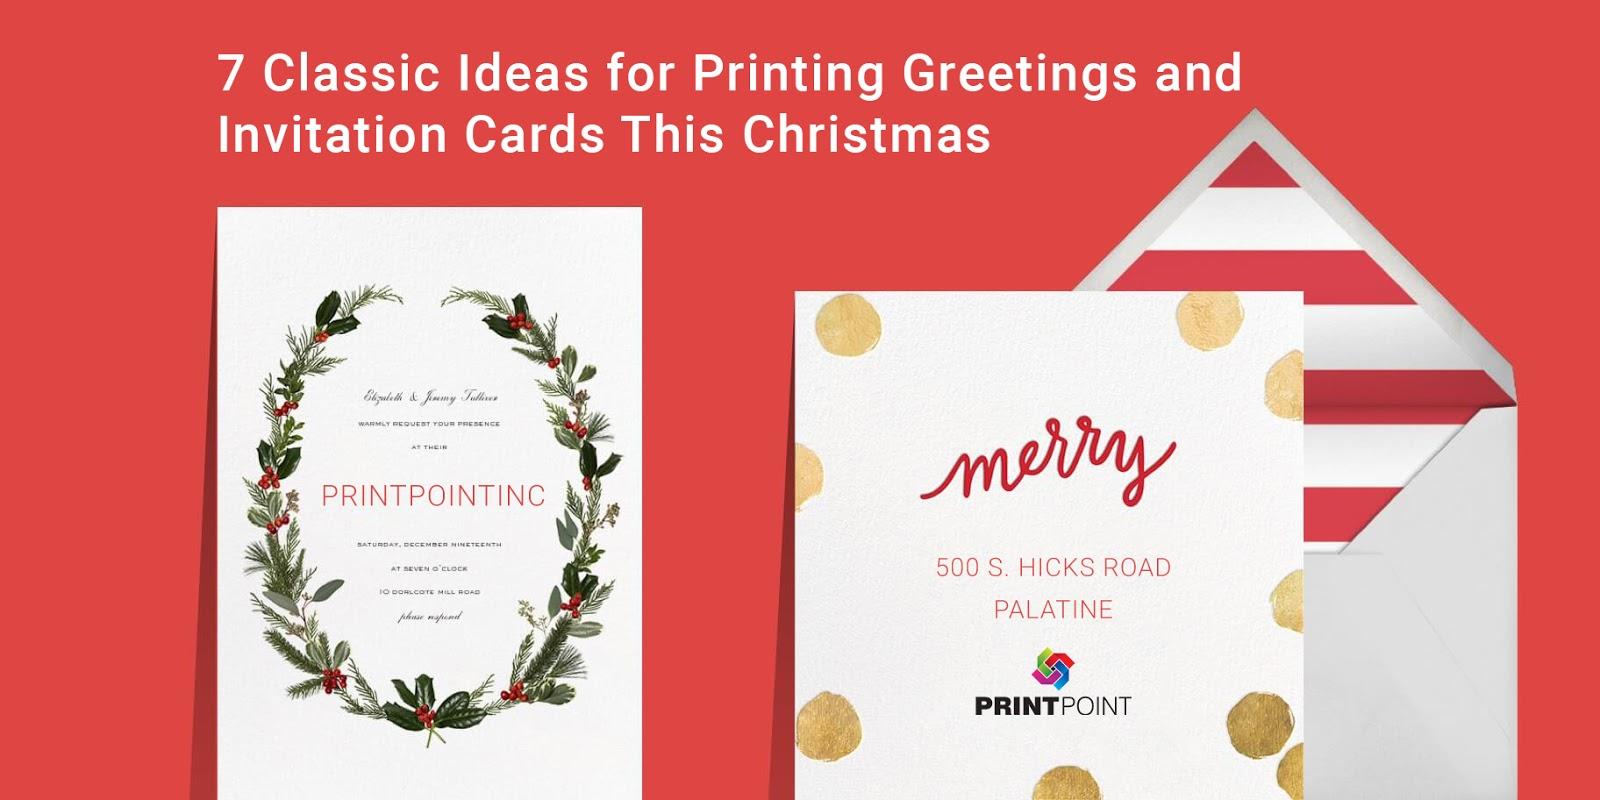 Print point inc online digital printing chicago banner printing greeting cards printing invitation cards printing printing company chicago business card printing colourmoves